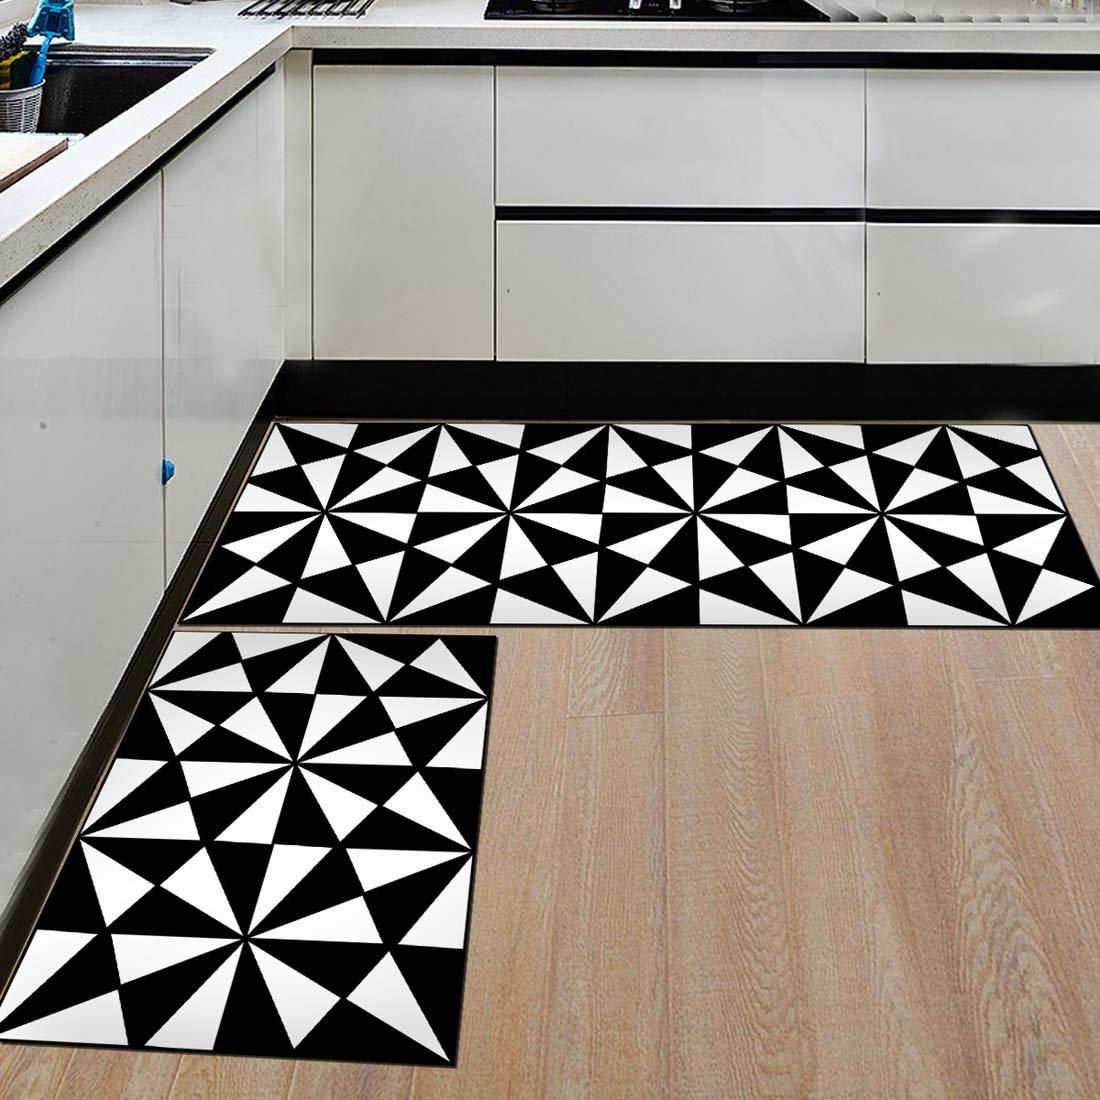 Amazon Com Nonslip Kitchen Mats And Rugs Black And White